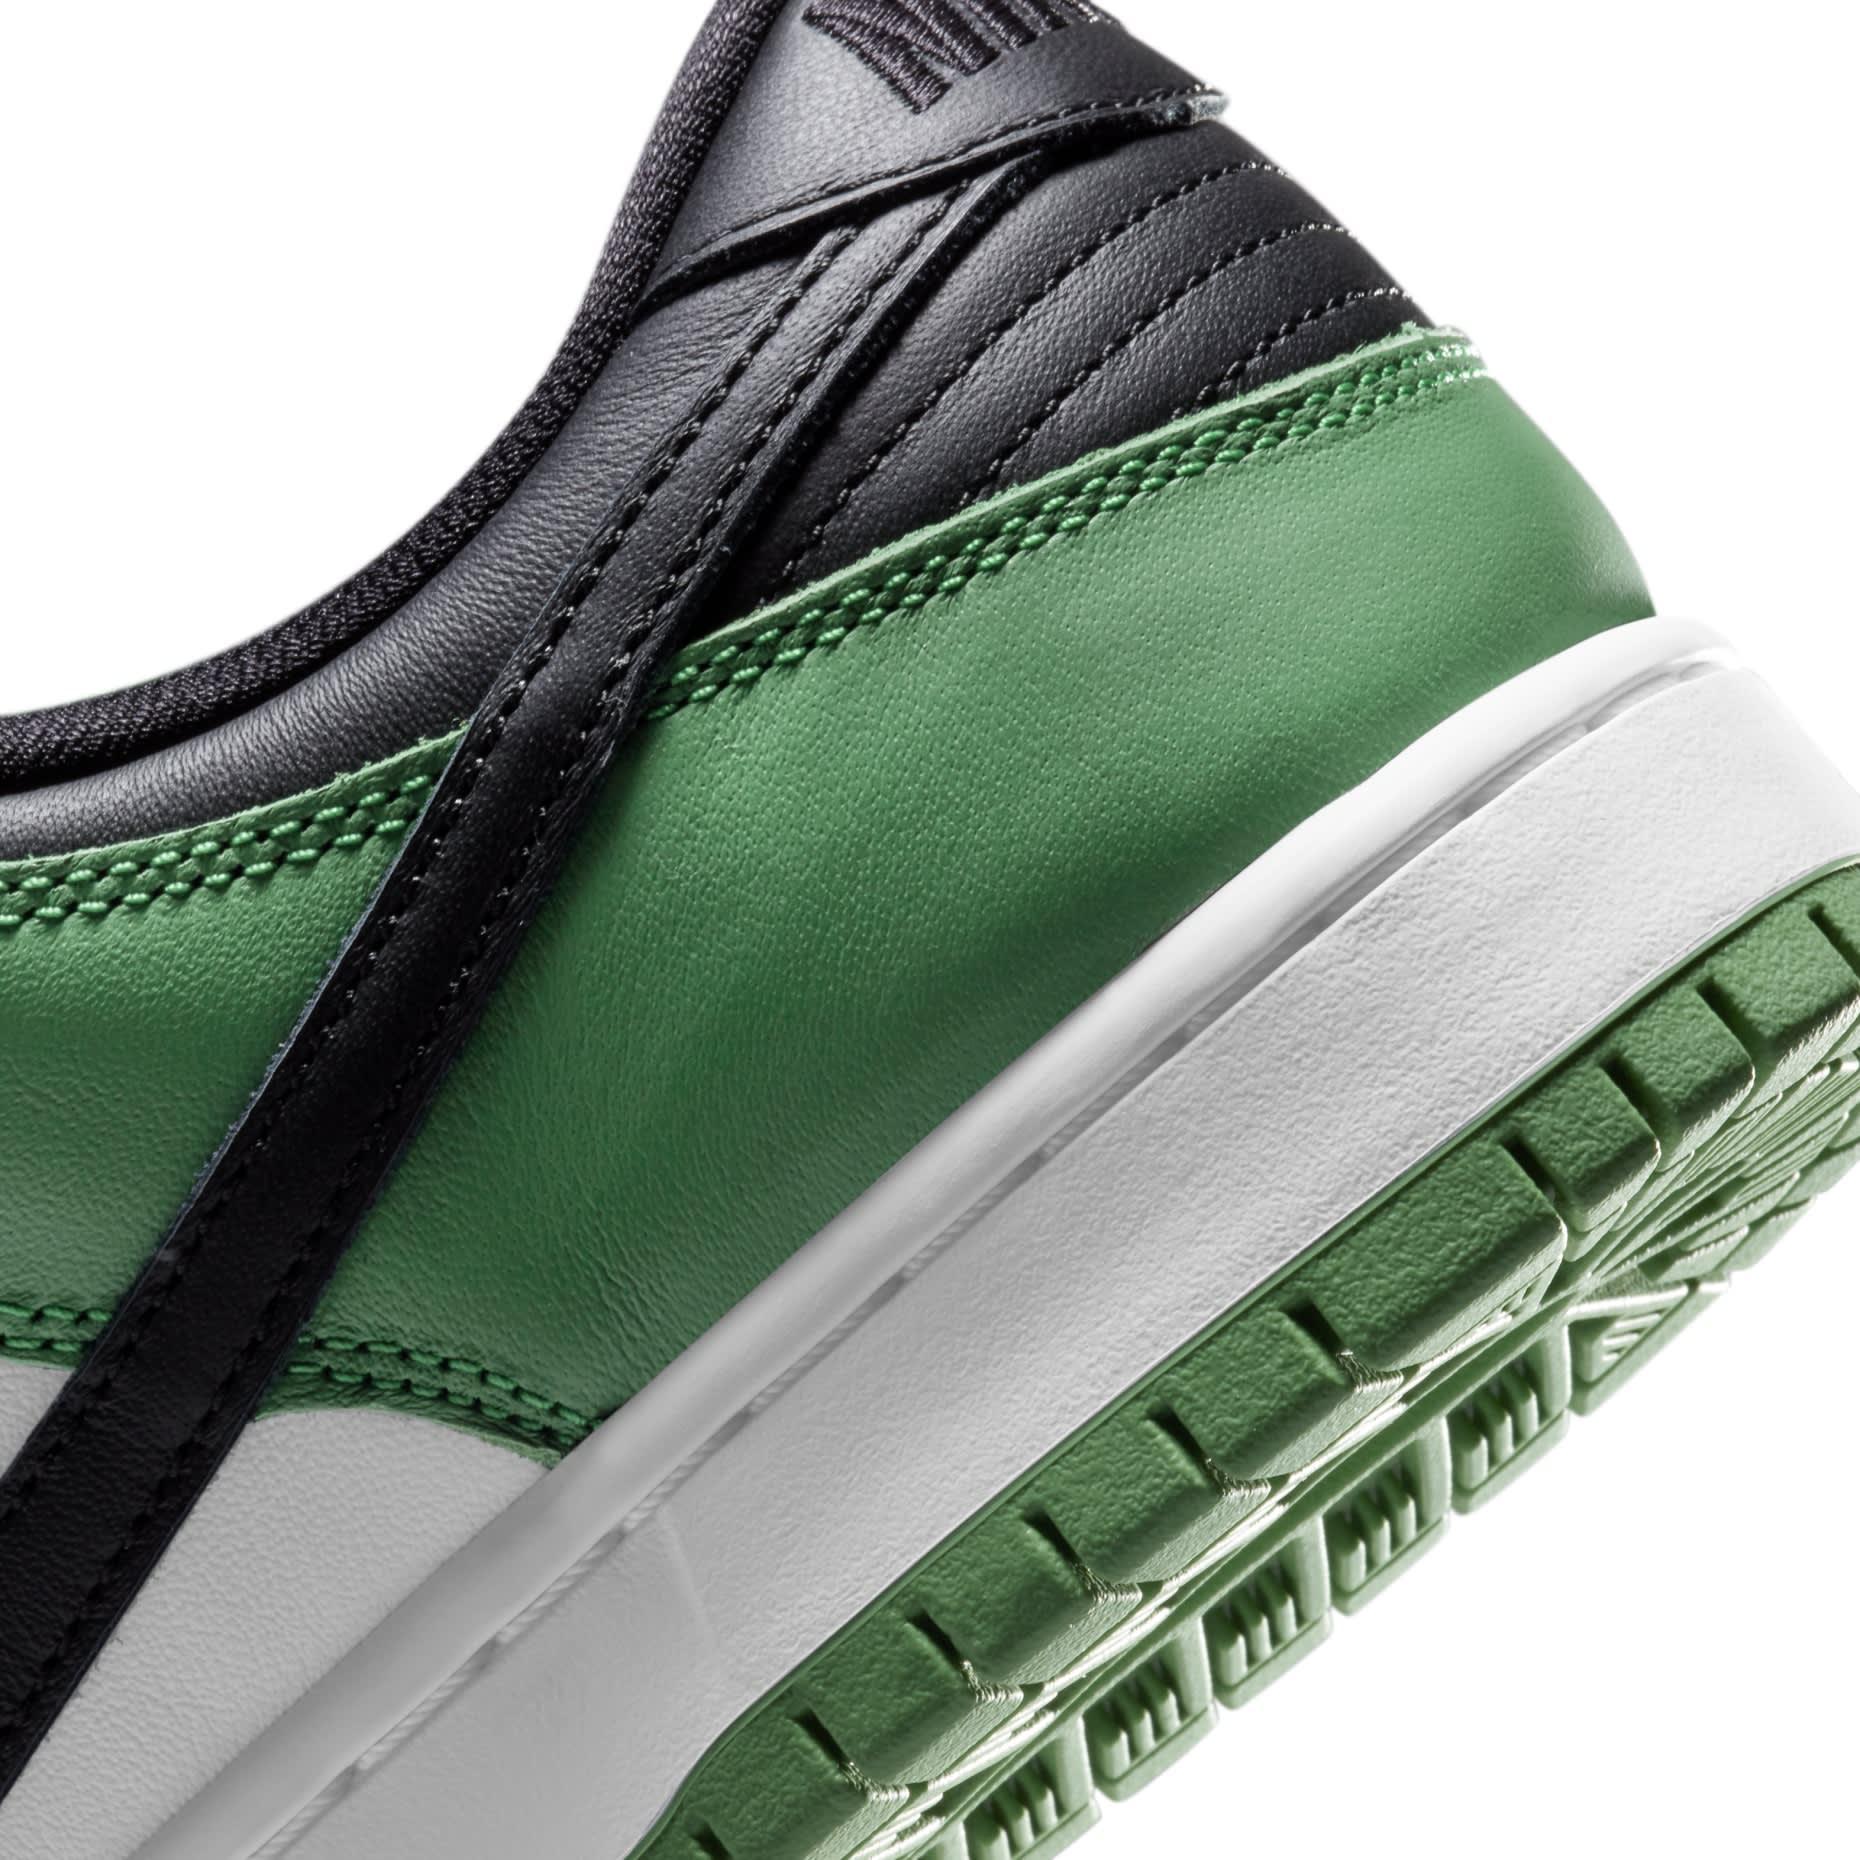 Nike SB Dunk Low 'Classic Green' BQ6817-302 Heel